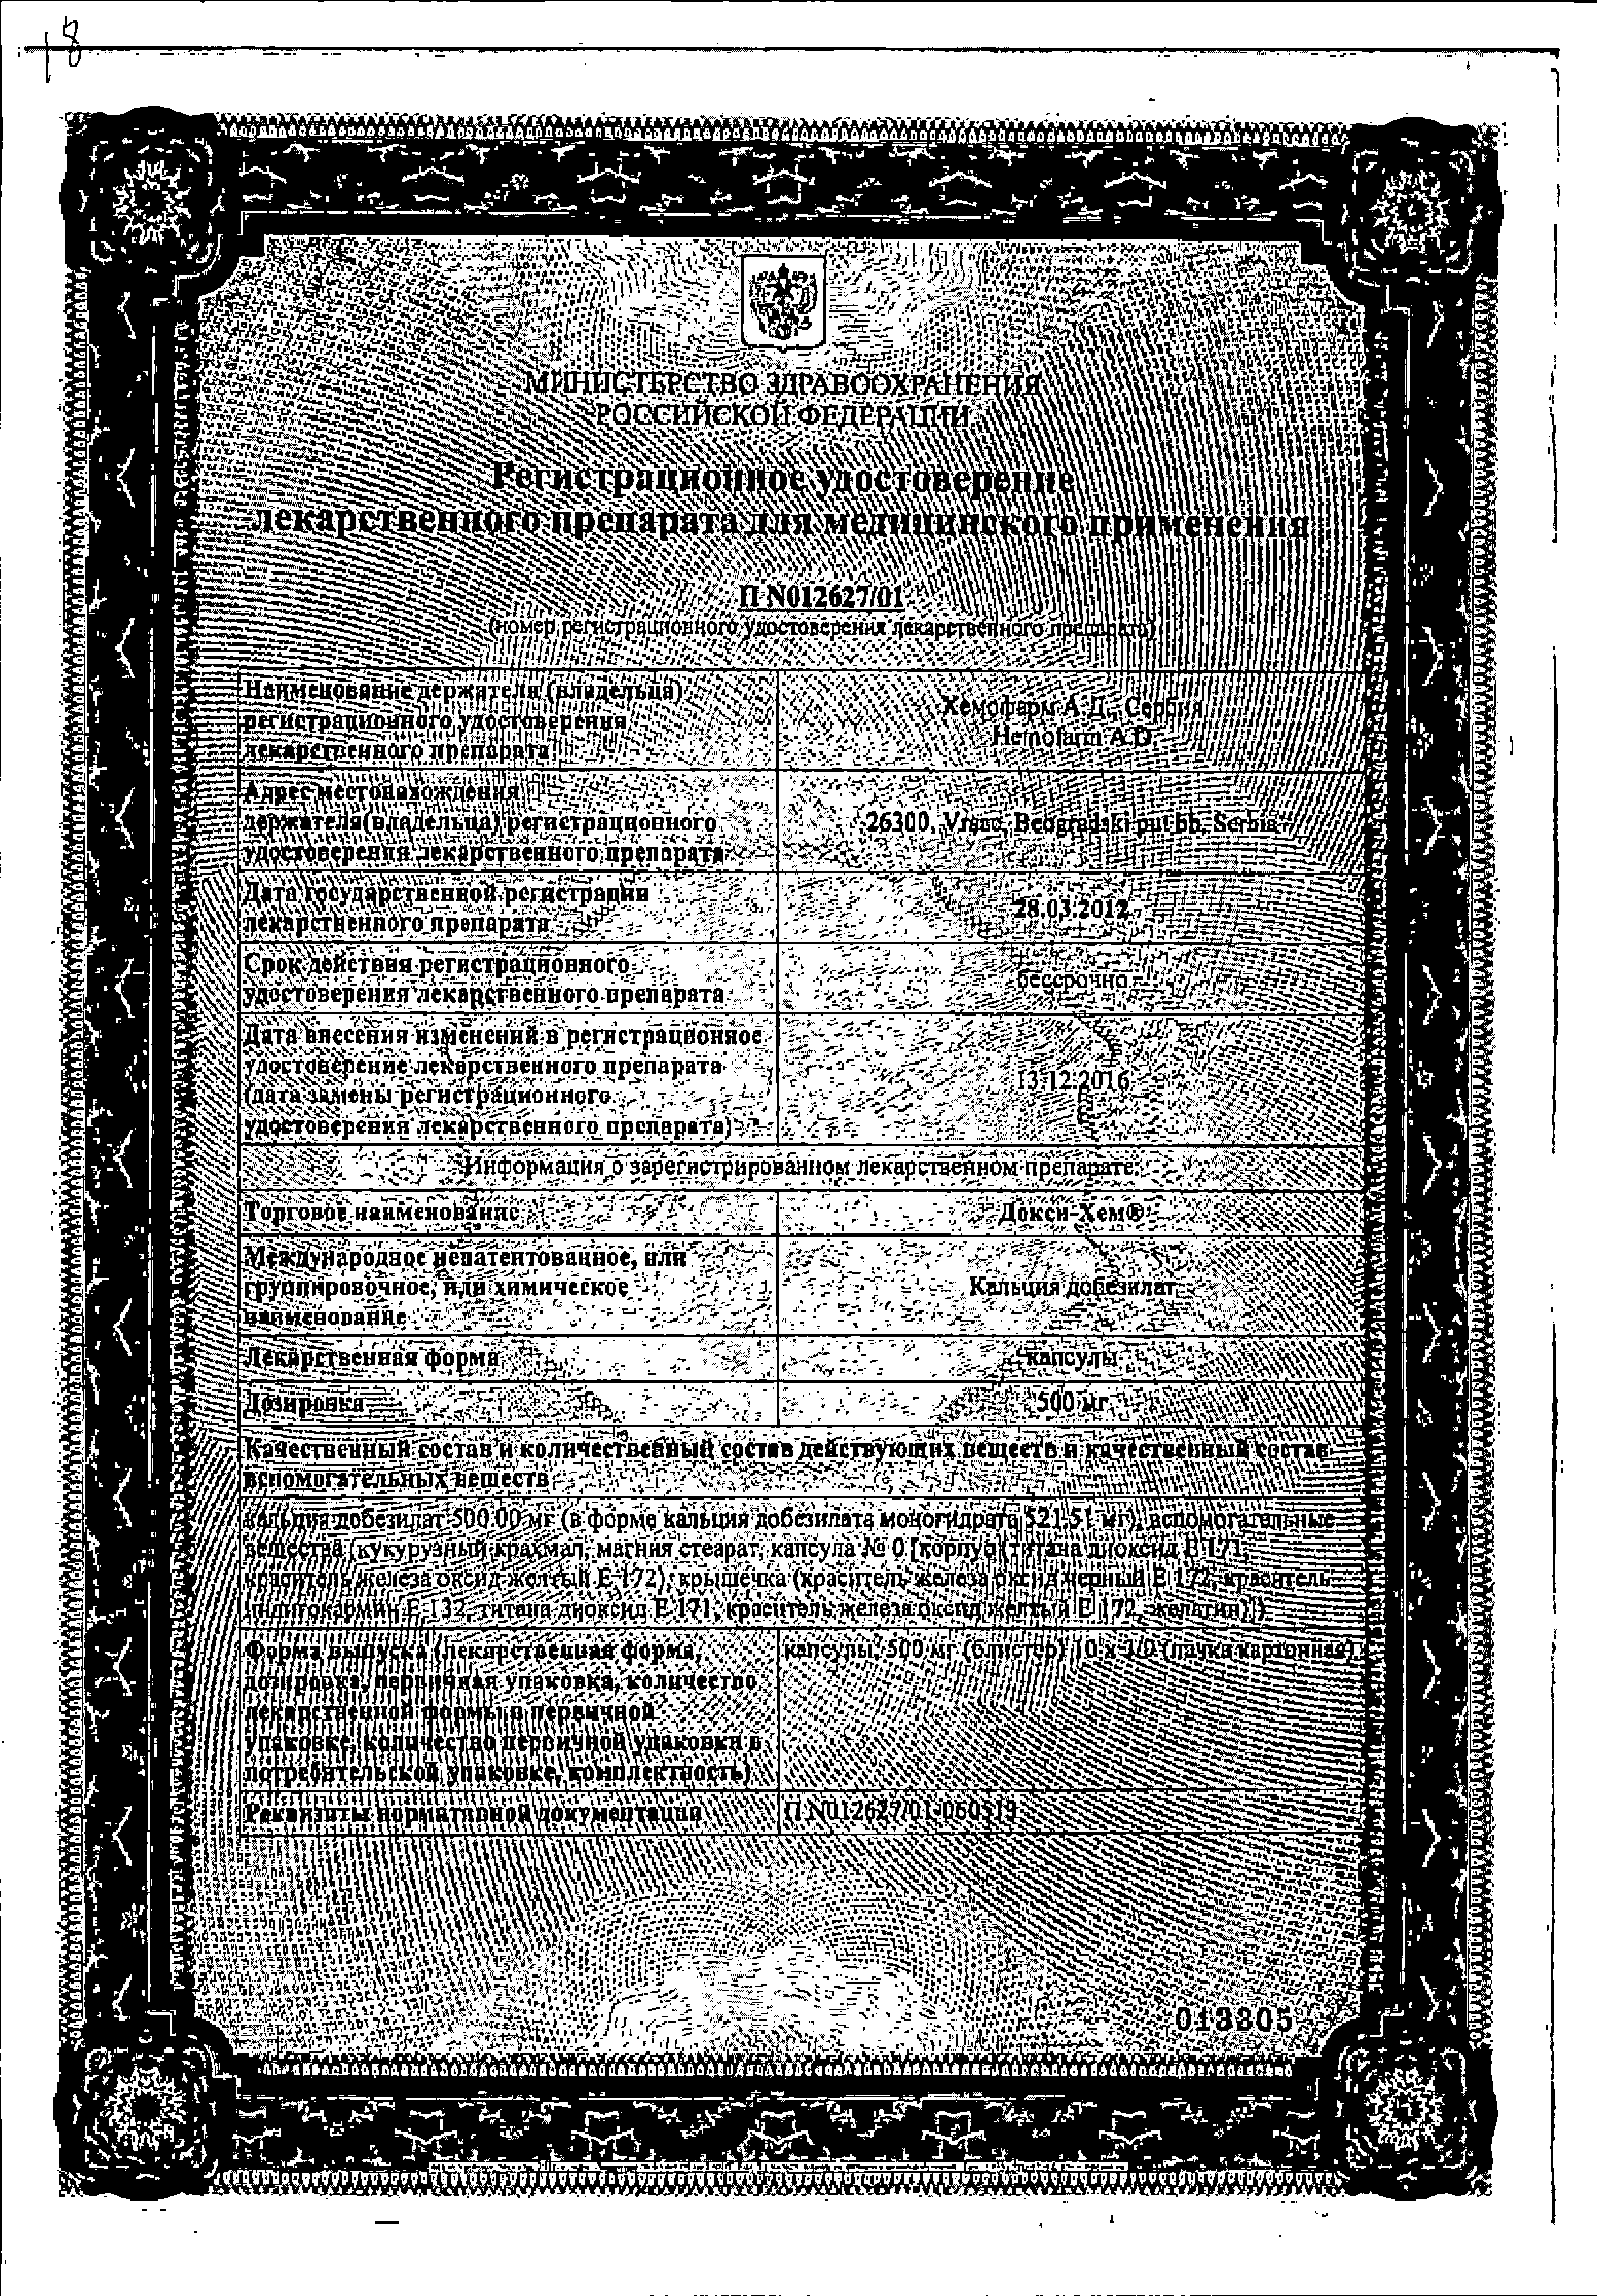 Докси-Хем сертификат